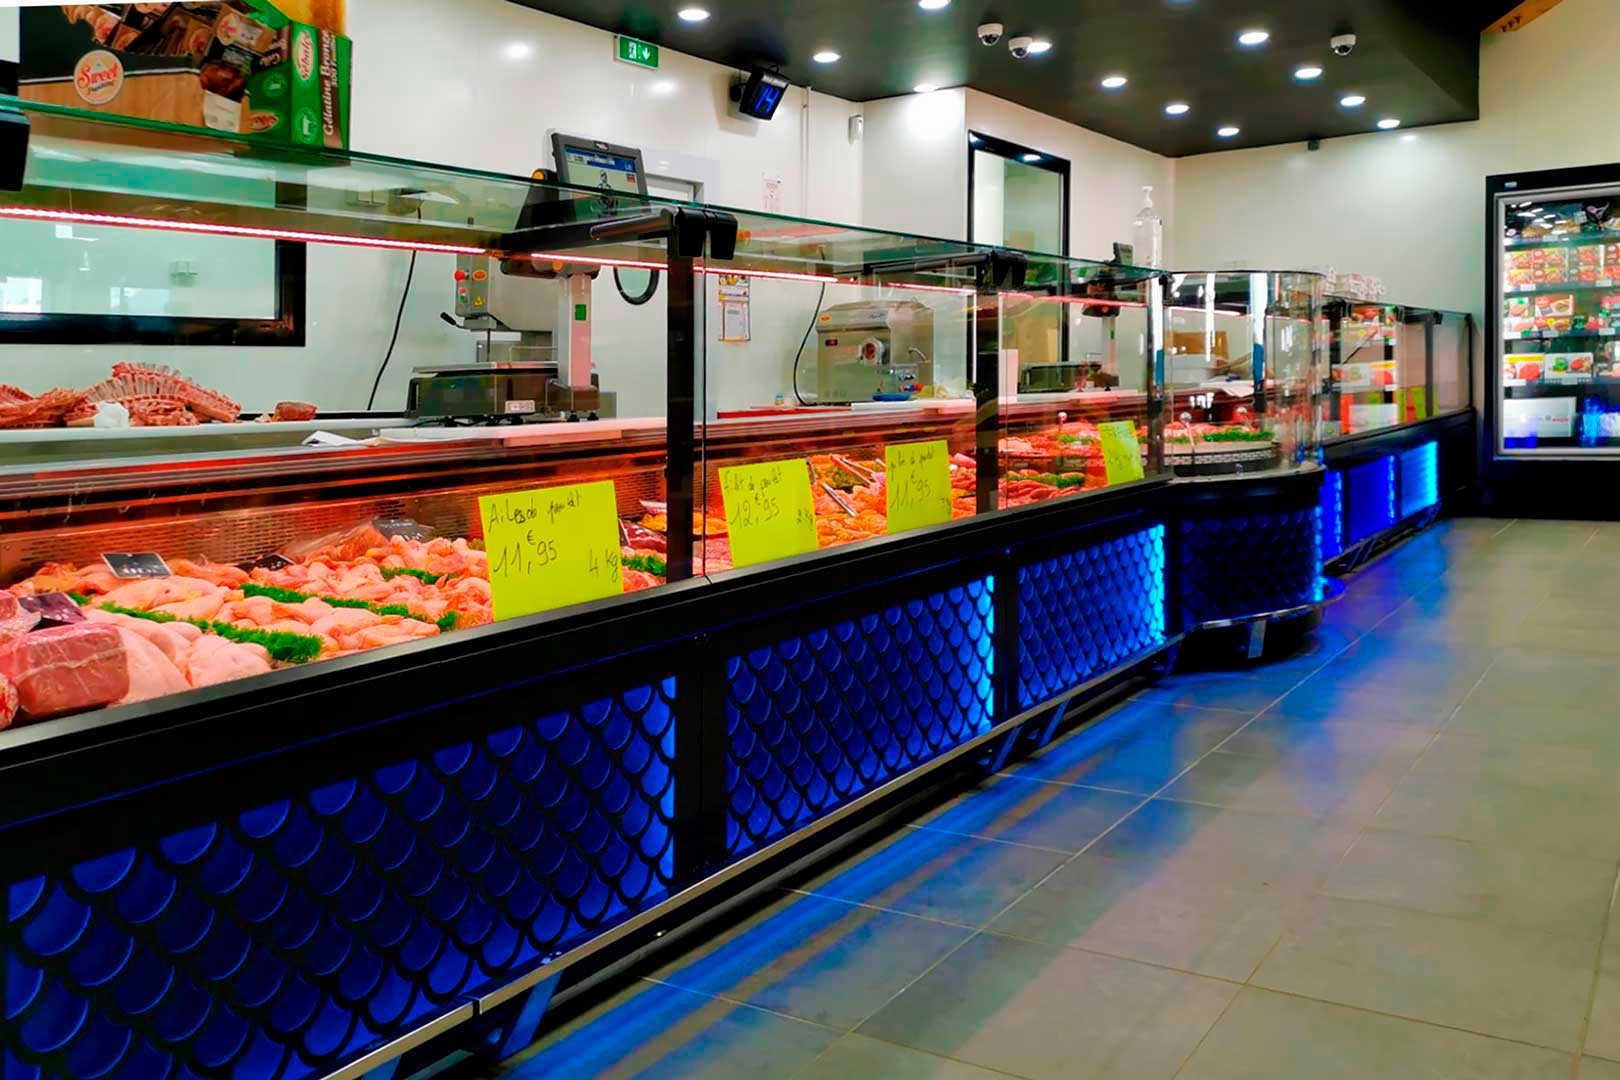 Refrigerated counters Missouri MC 120 M, minimarket PYRAMIDE in France